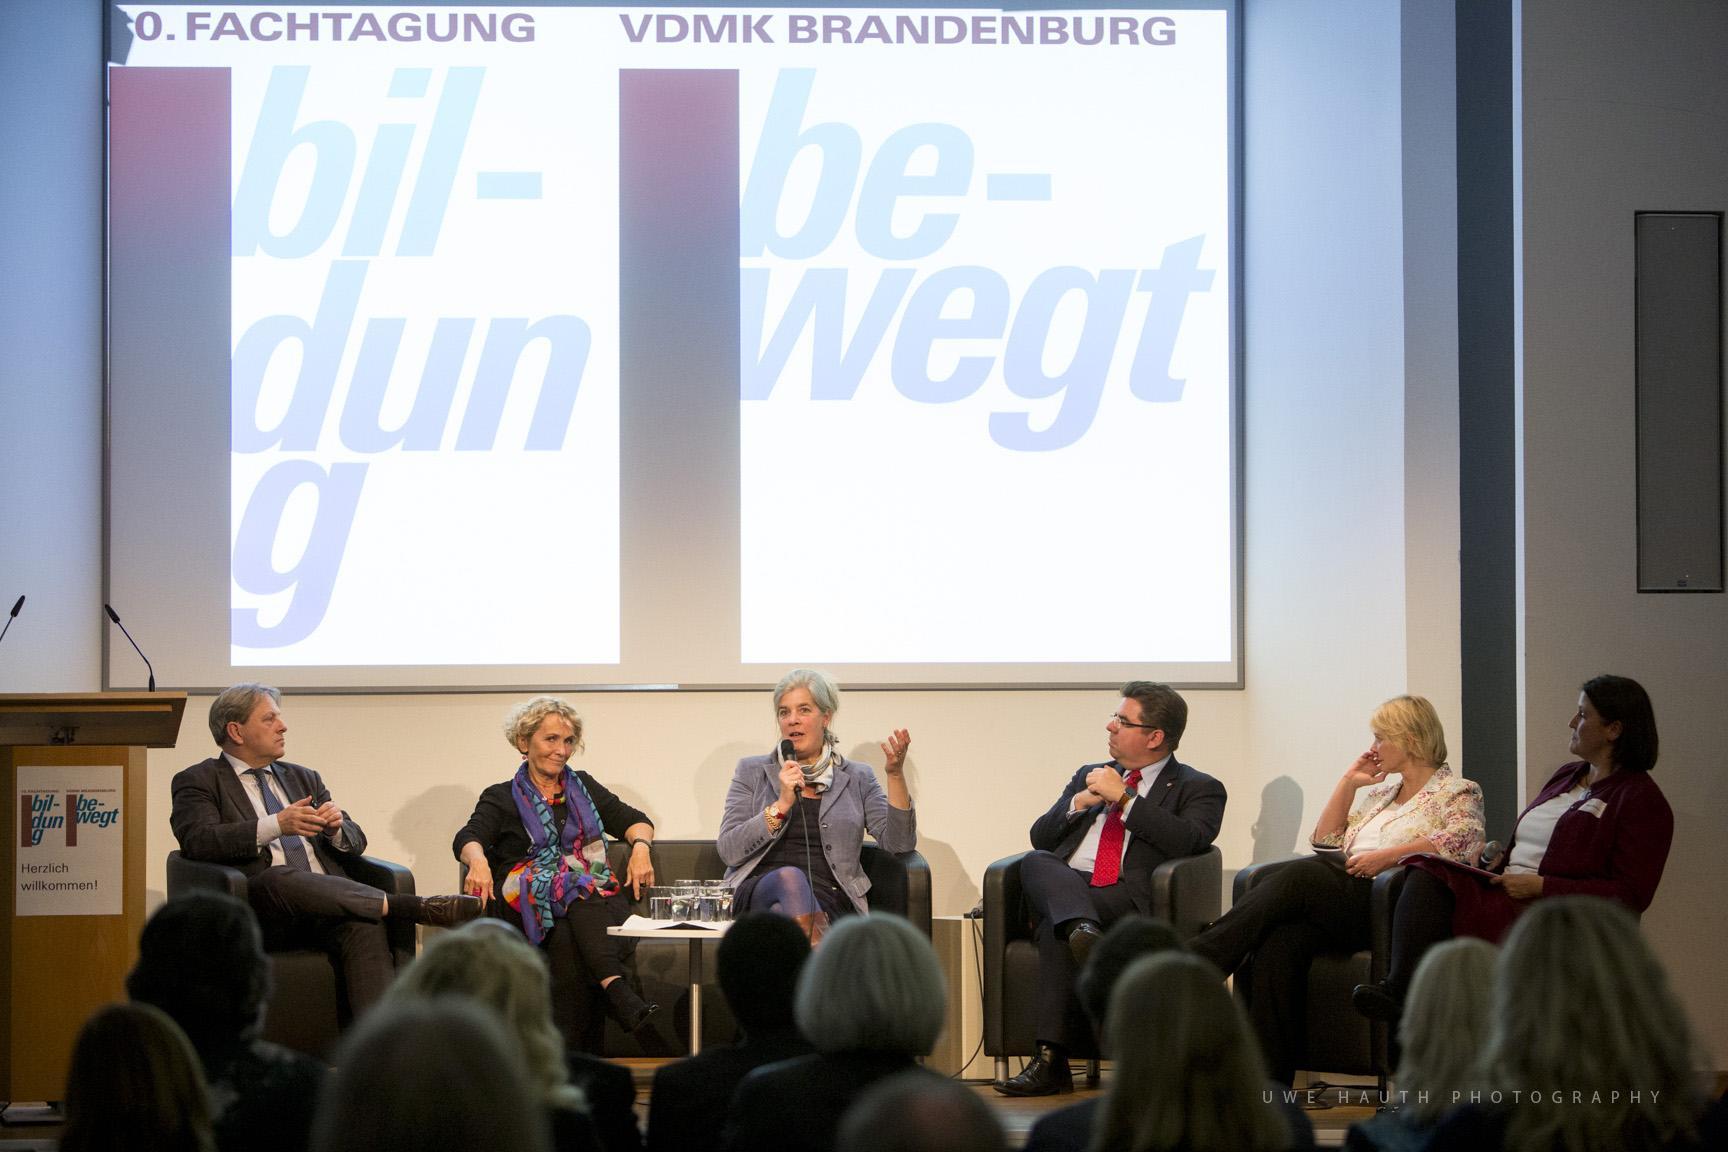 Podiumsdiskussion zum Thema Bildung bewegt